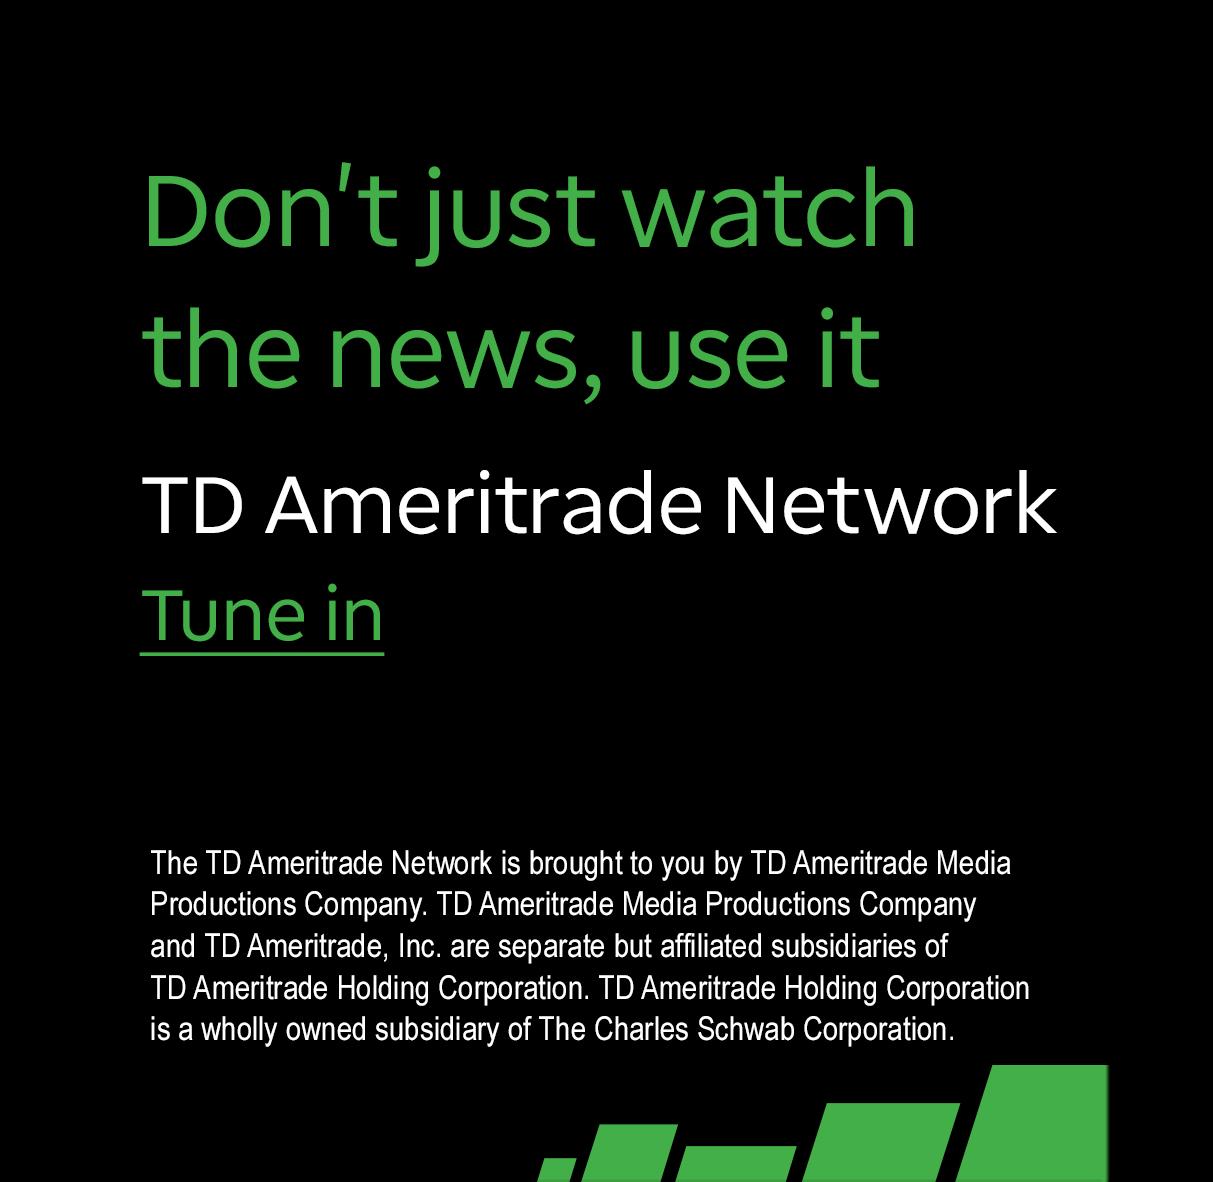 TDAmeritrade Network